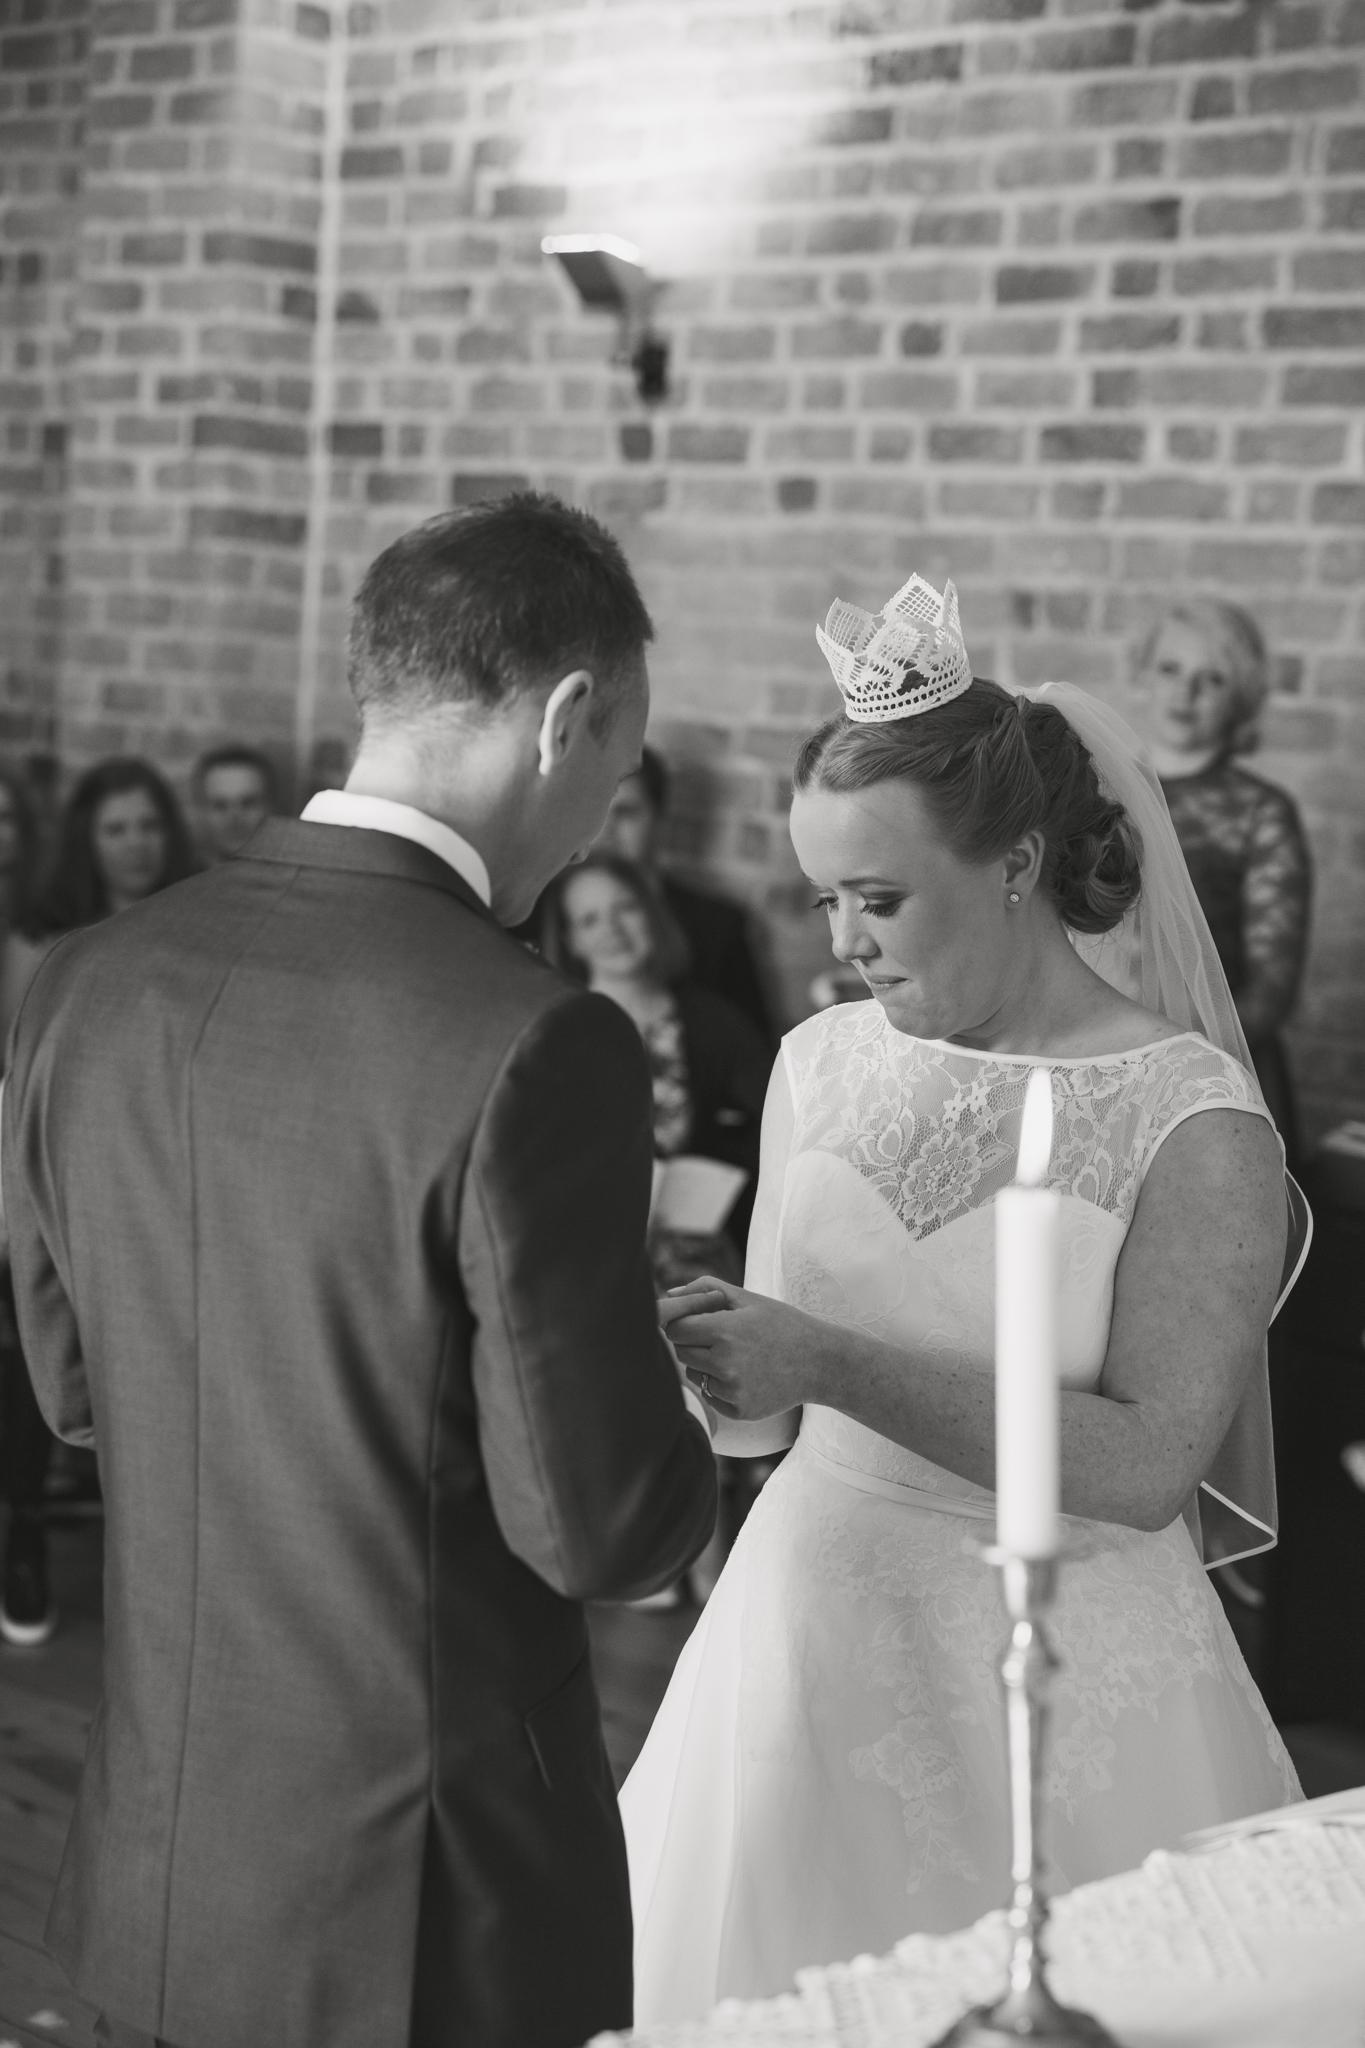 ViOli Photography bröllopsfotograf-Karlshamn-Blekinge-Ronneby-Karlskrona-Sölvesborg-Bromölla-Kristianstad (22 av 35)